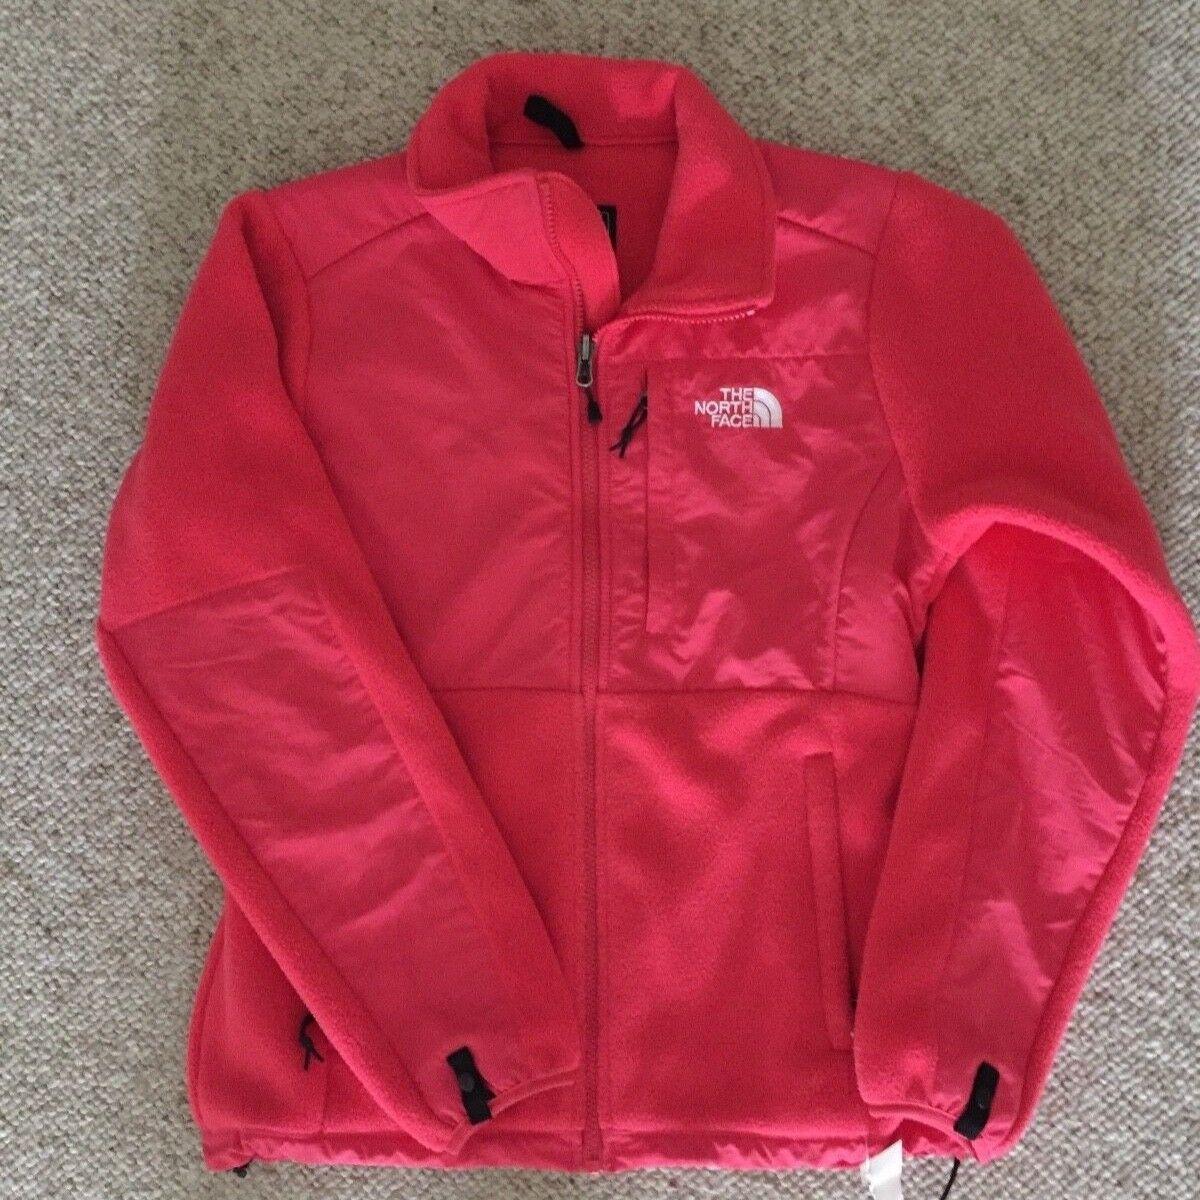 NWT North Face Denali Fleece Neon Pink womens small